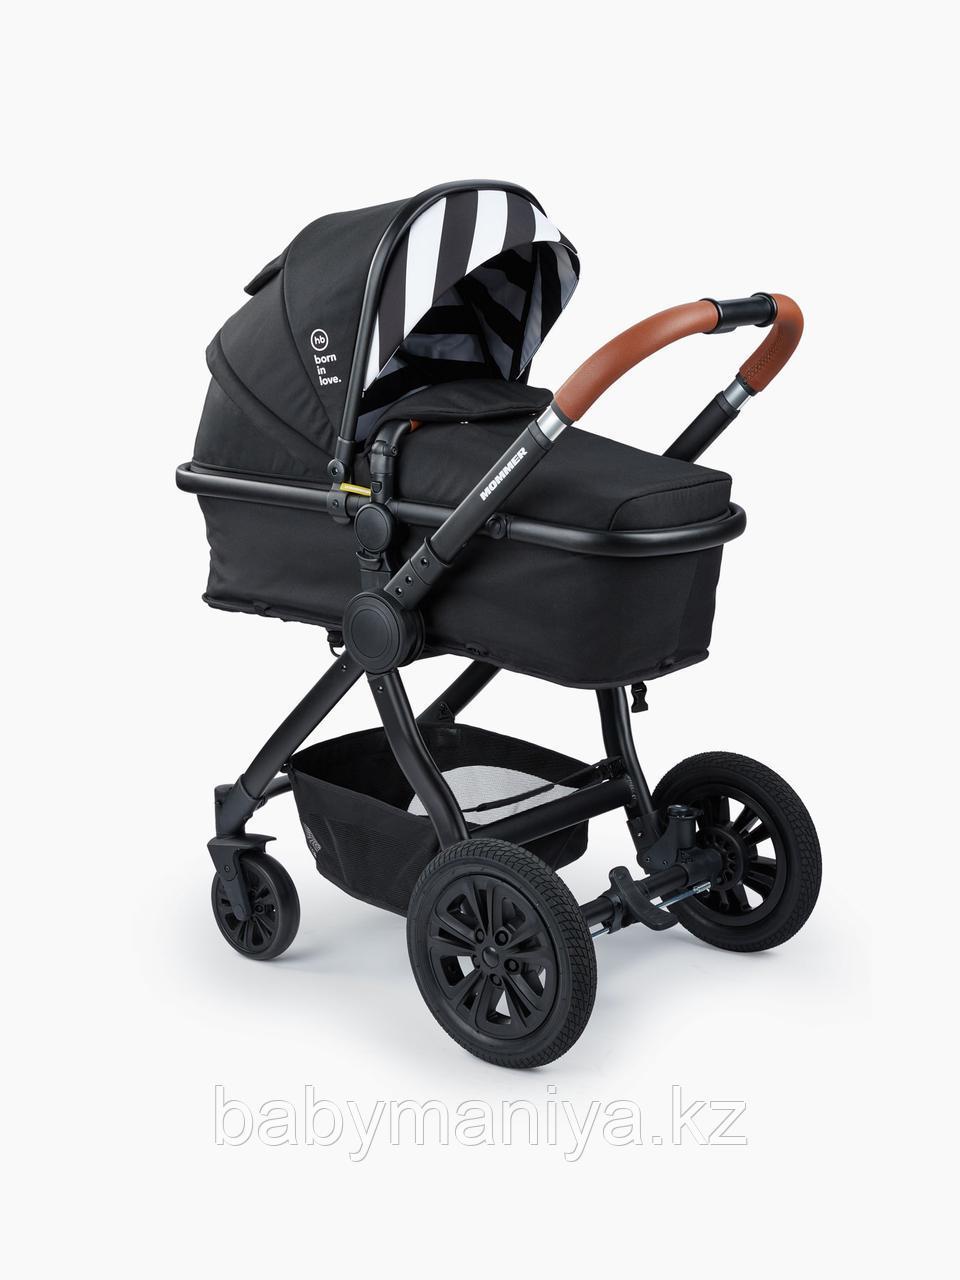 Коляска-трансформер 2 в 1 Happy Baby MOMMER Black